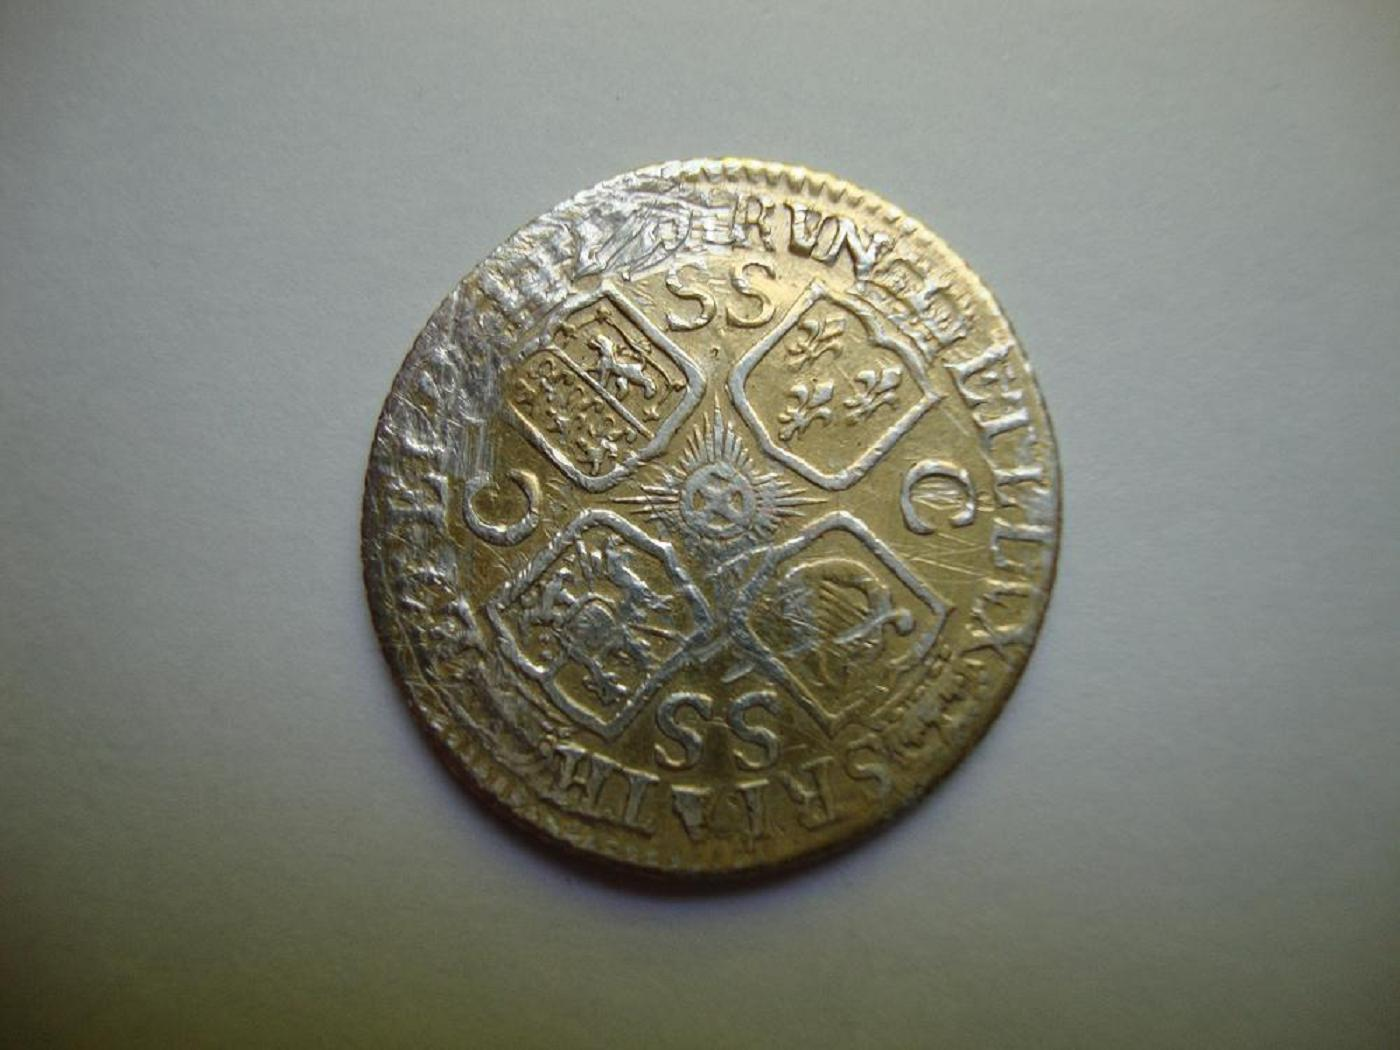 Gran Bretaña, Shilling, George I, 1723. 660836554